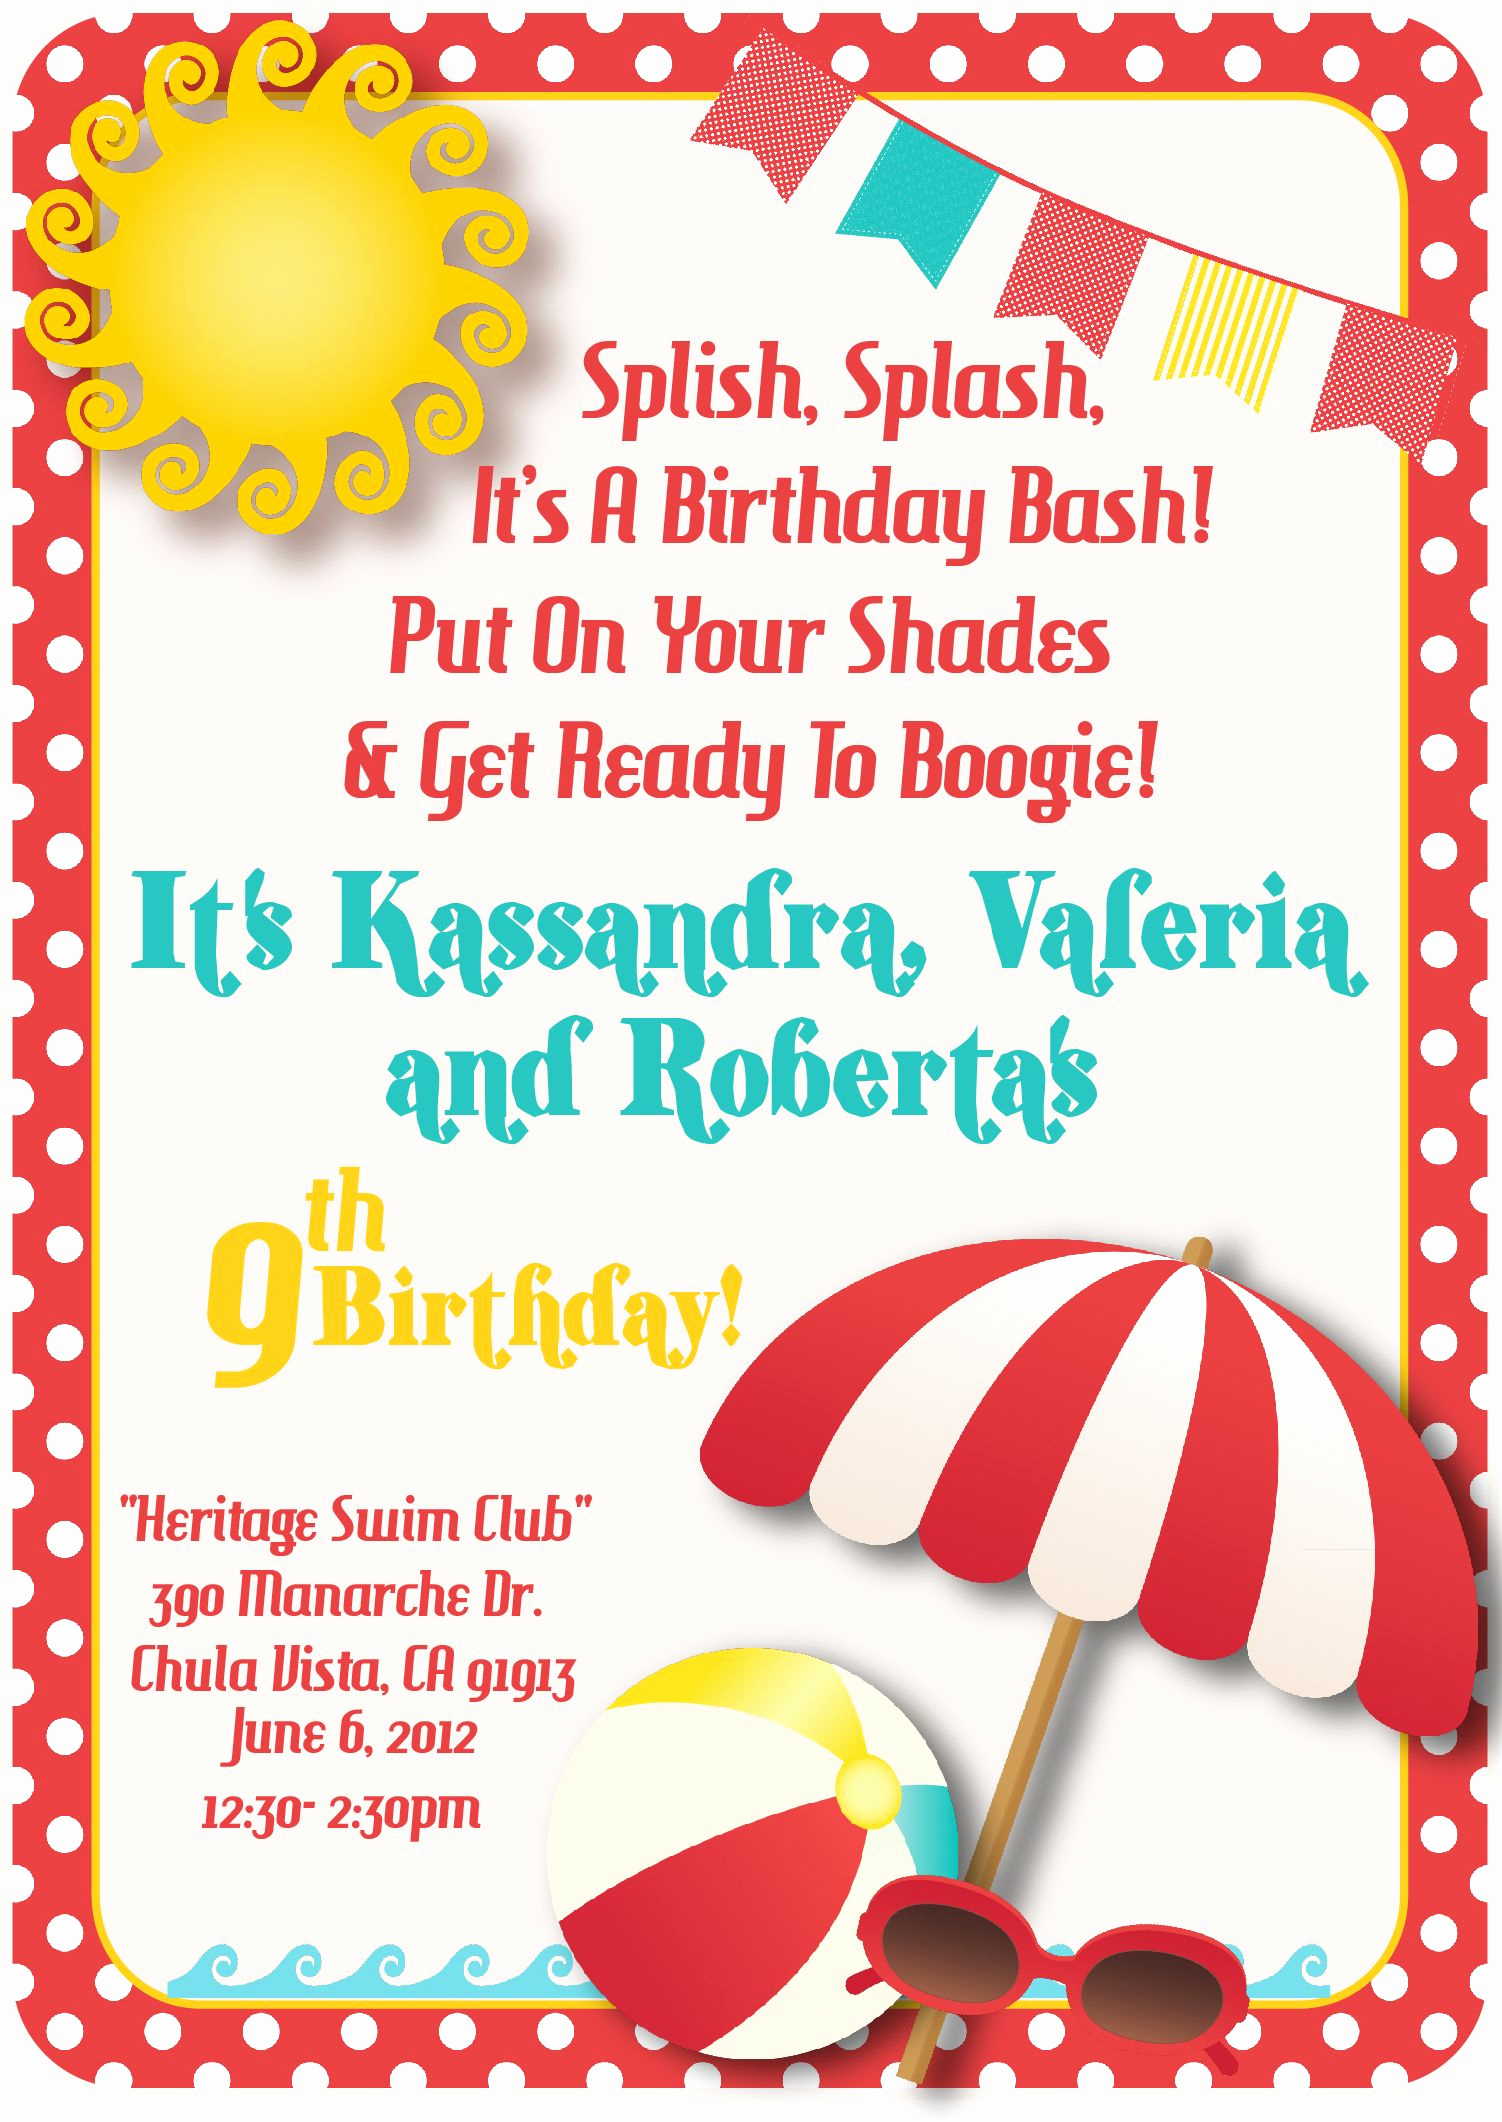 Free Art Party Invitation Templates Fresh Download A Free Printable Party Invitation Template with A